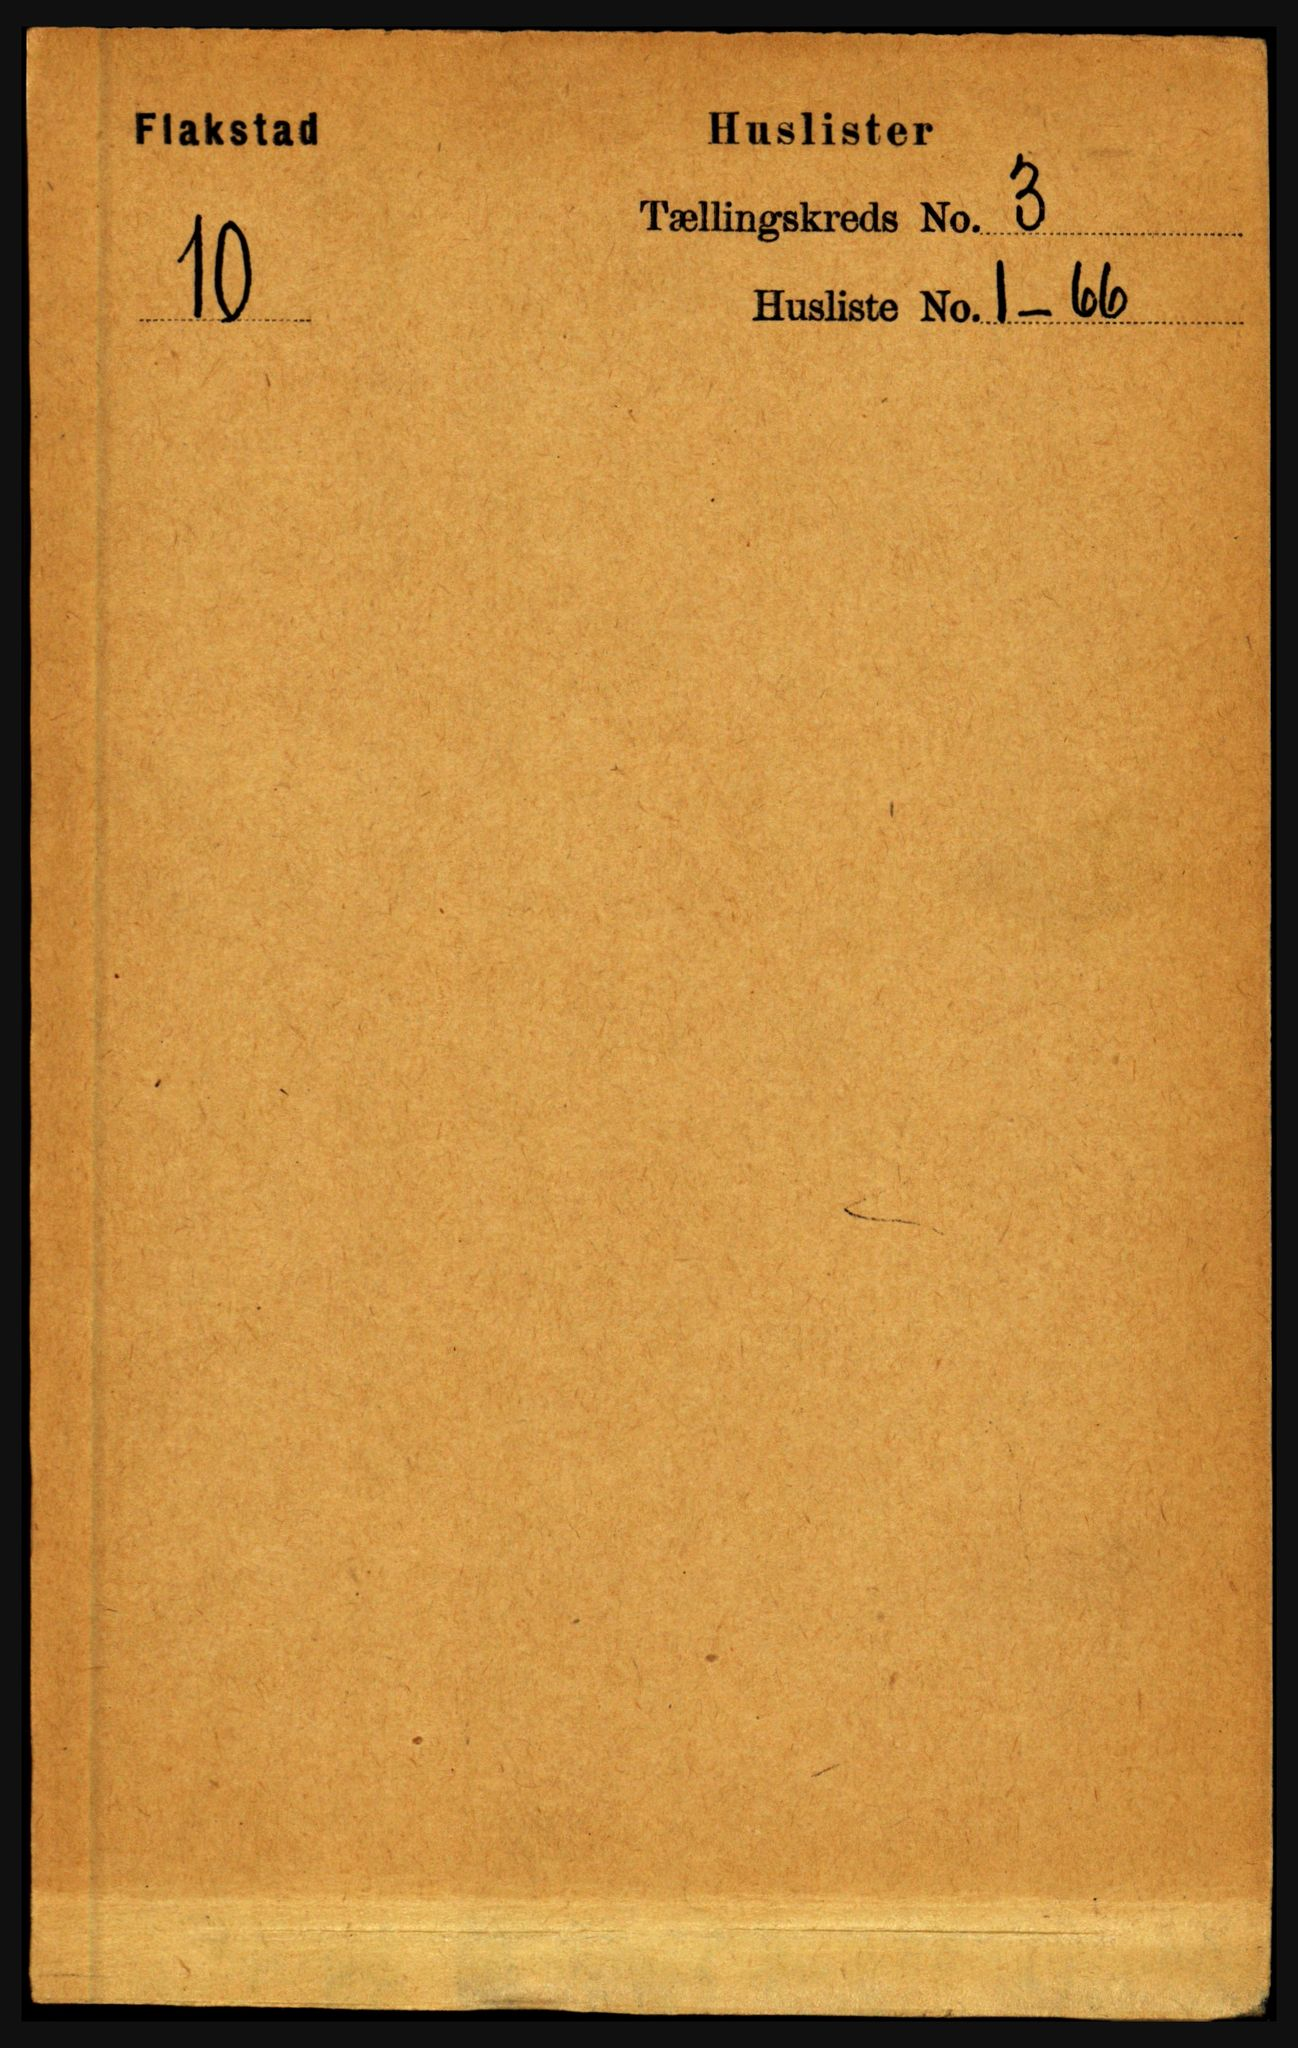 RA, Folketelling 1891 for 1859 Flakstad herred, 1891, s. 1230